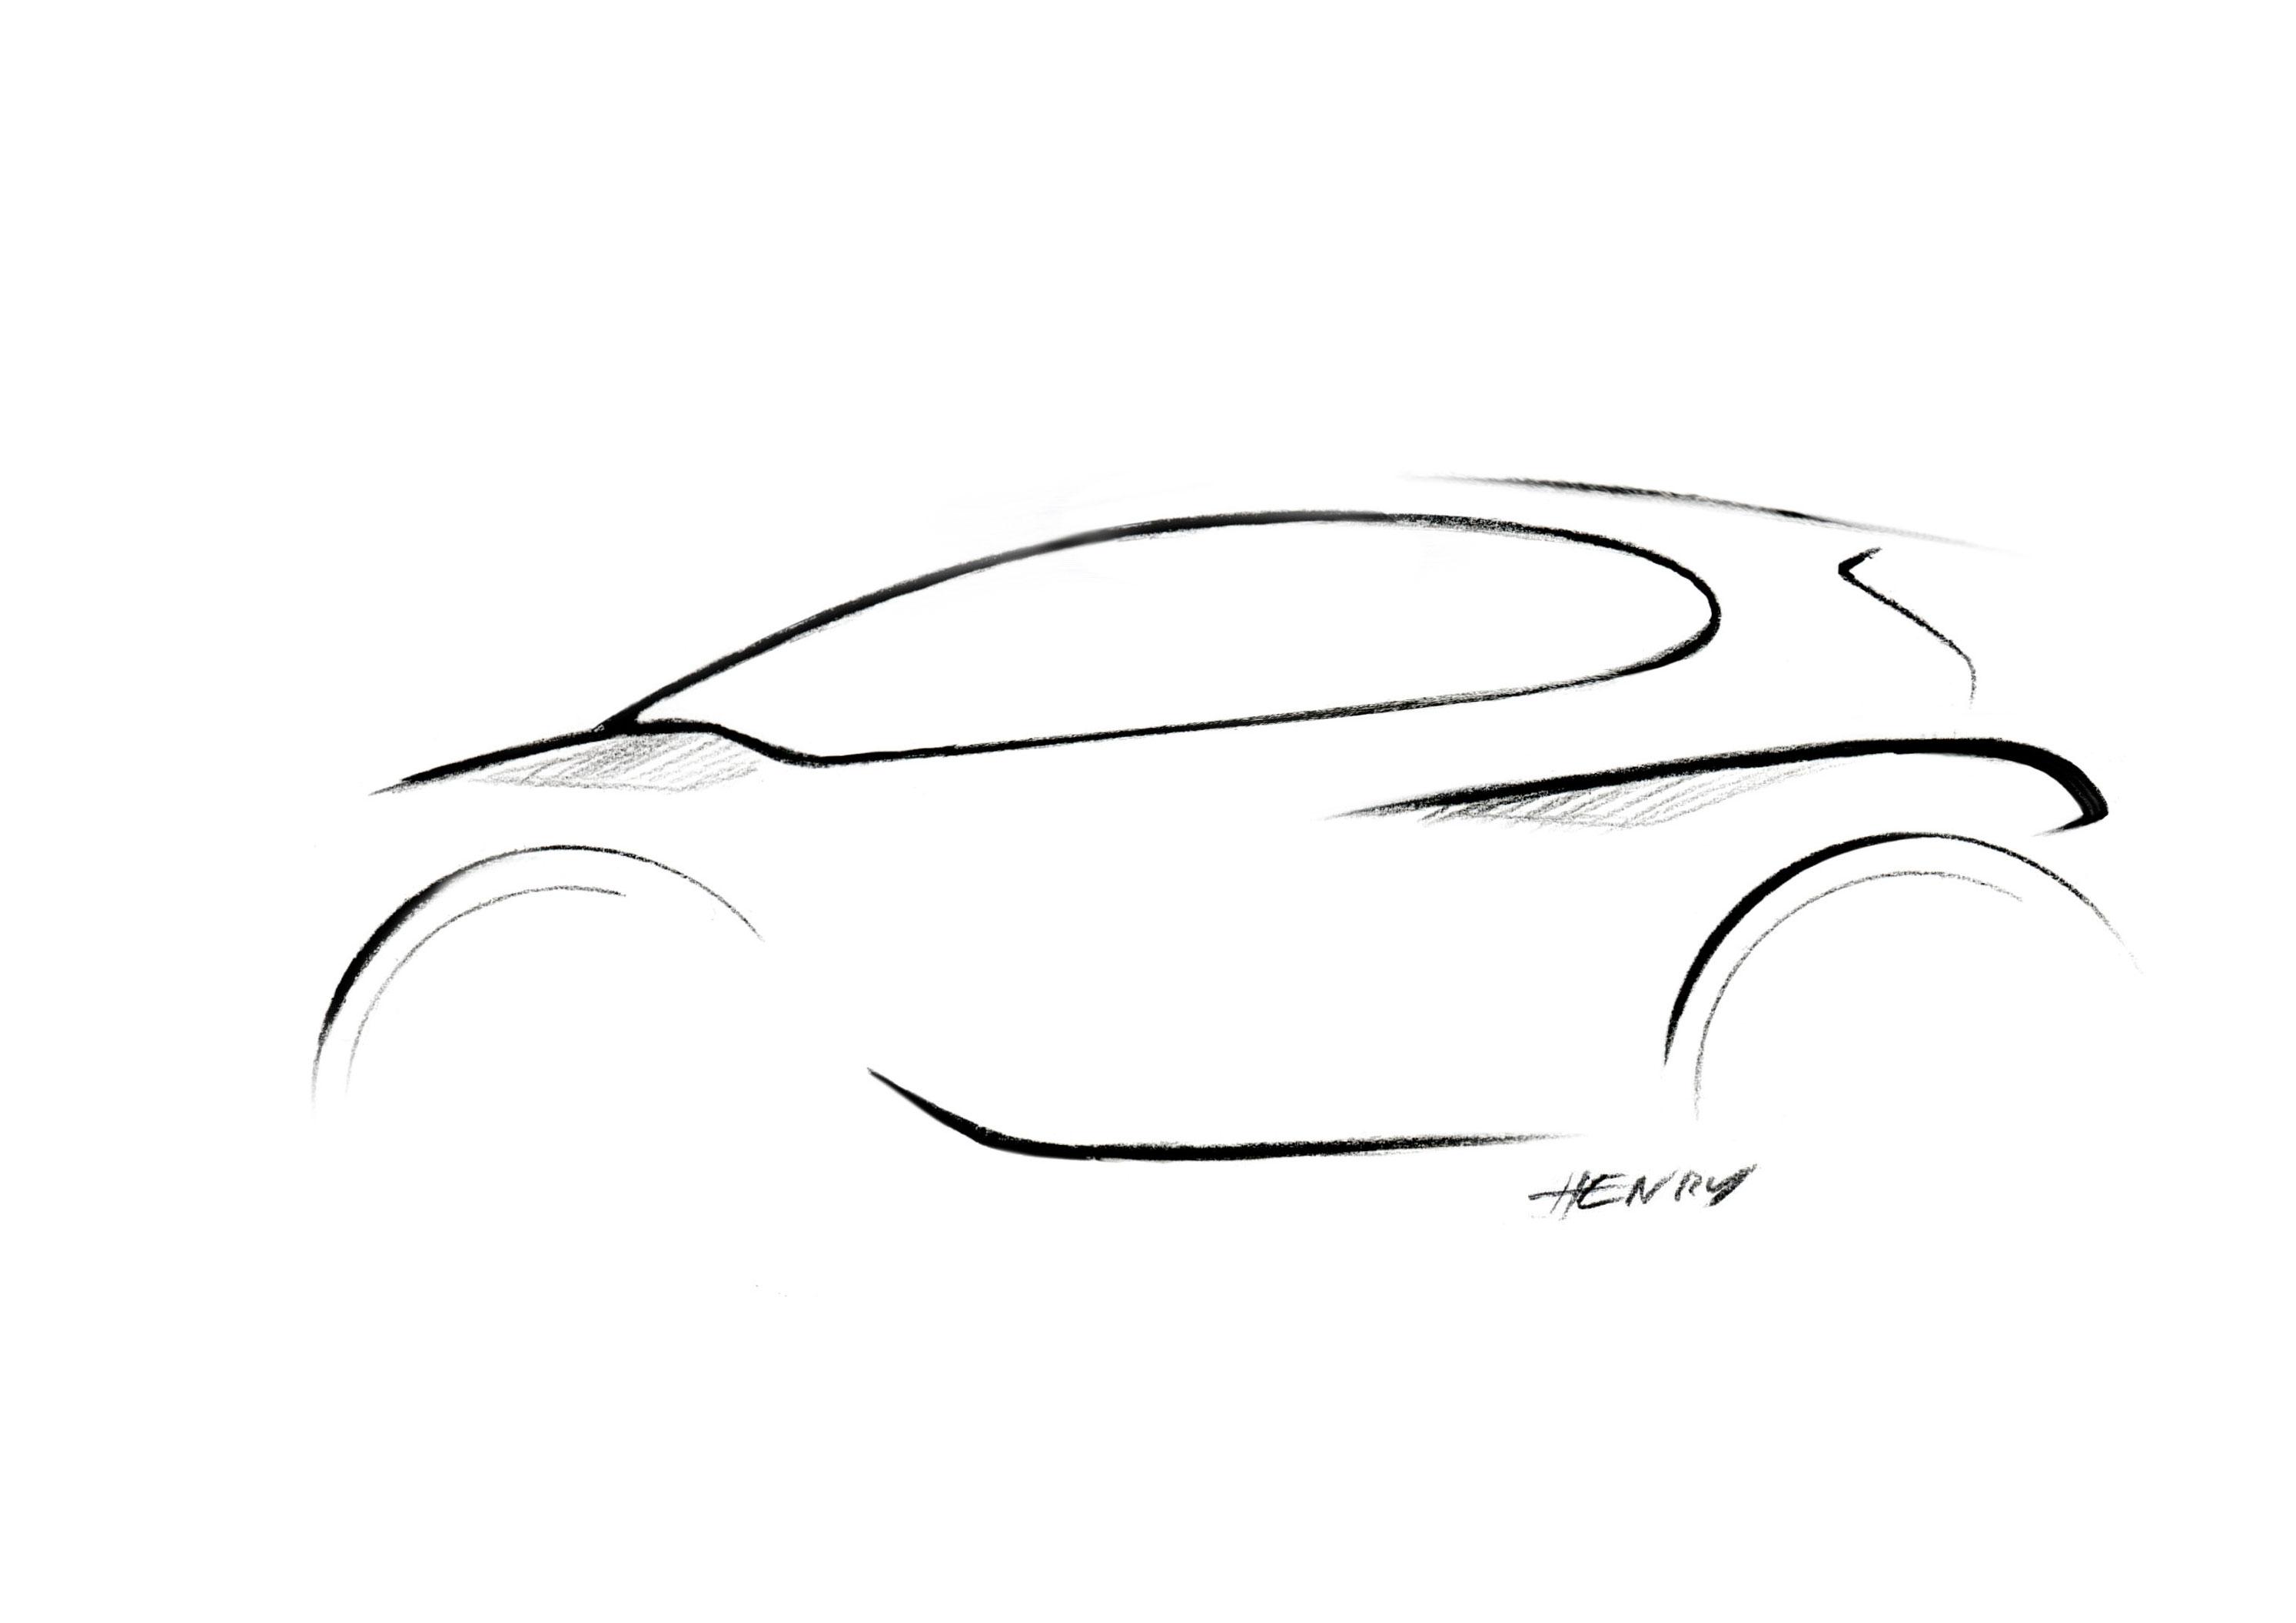 Peugeot 208 Design Sketch Car Body Design